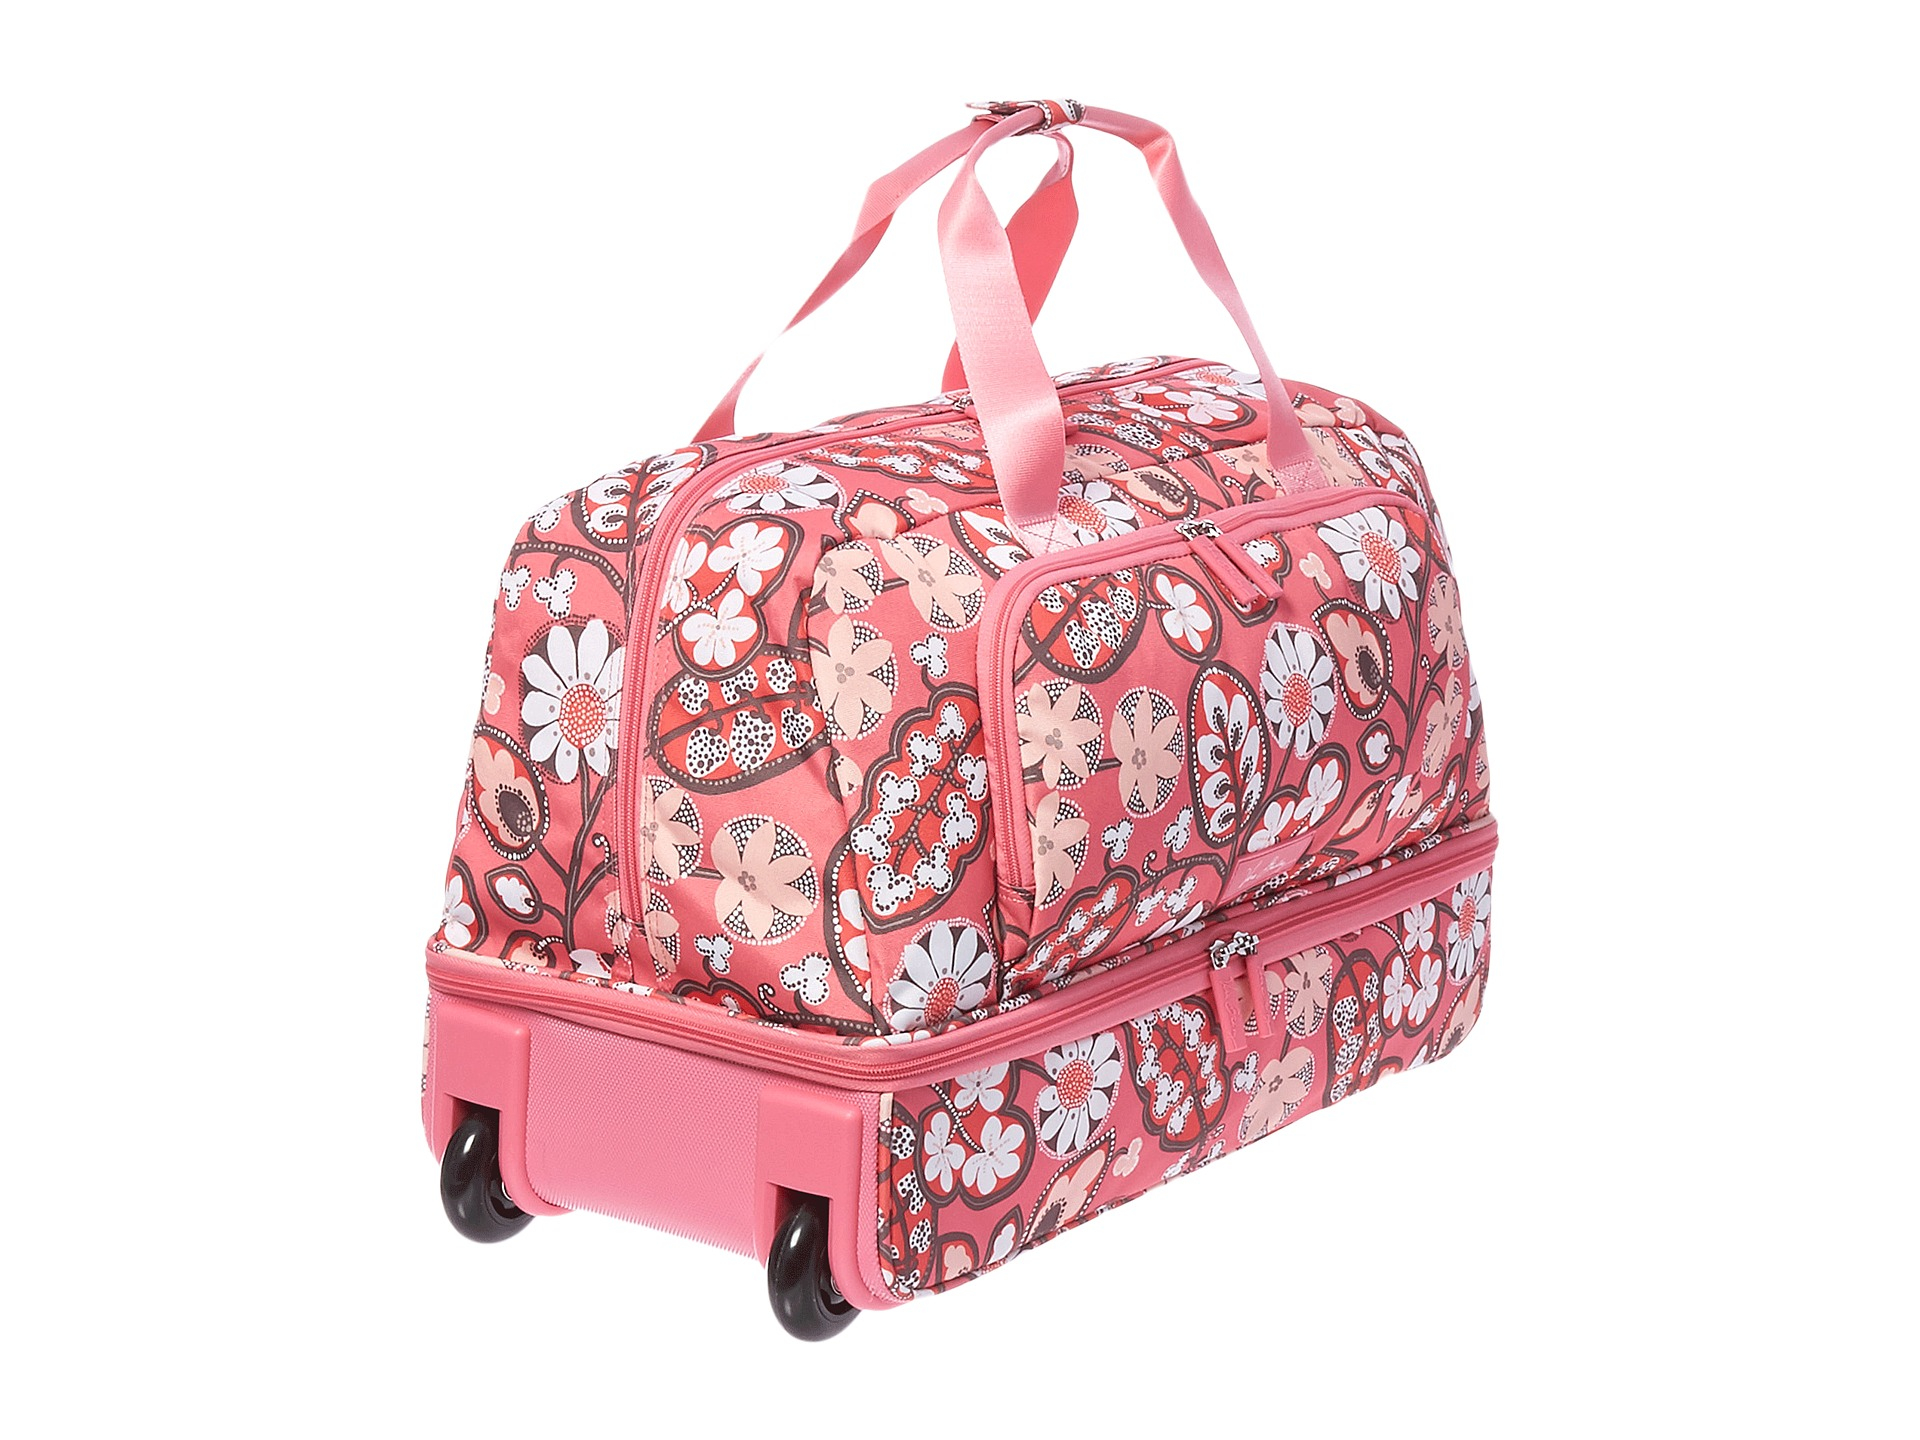 9818b4d3ab5e Lyst - Vera Bradley Lighten Up Large Wheeled Duffel in Pink